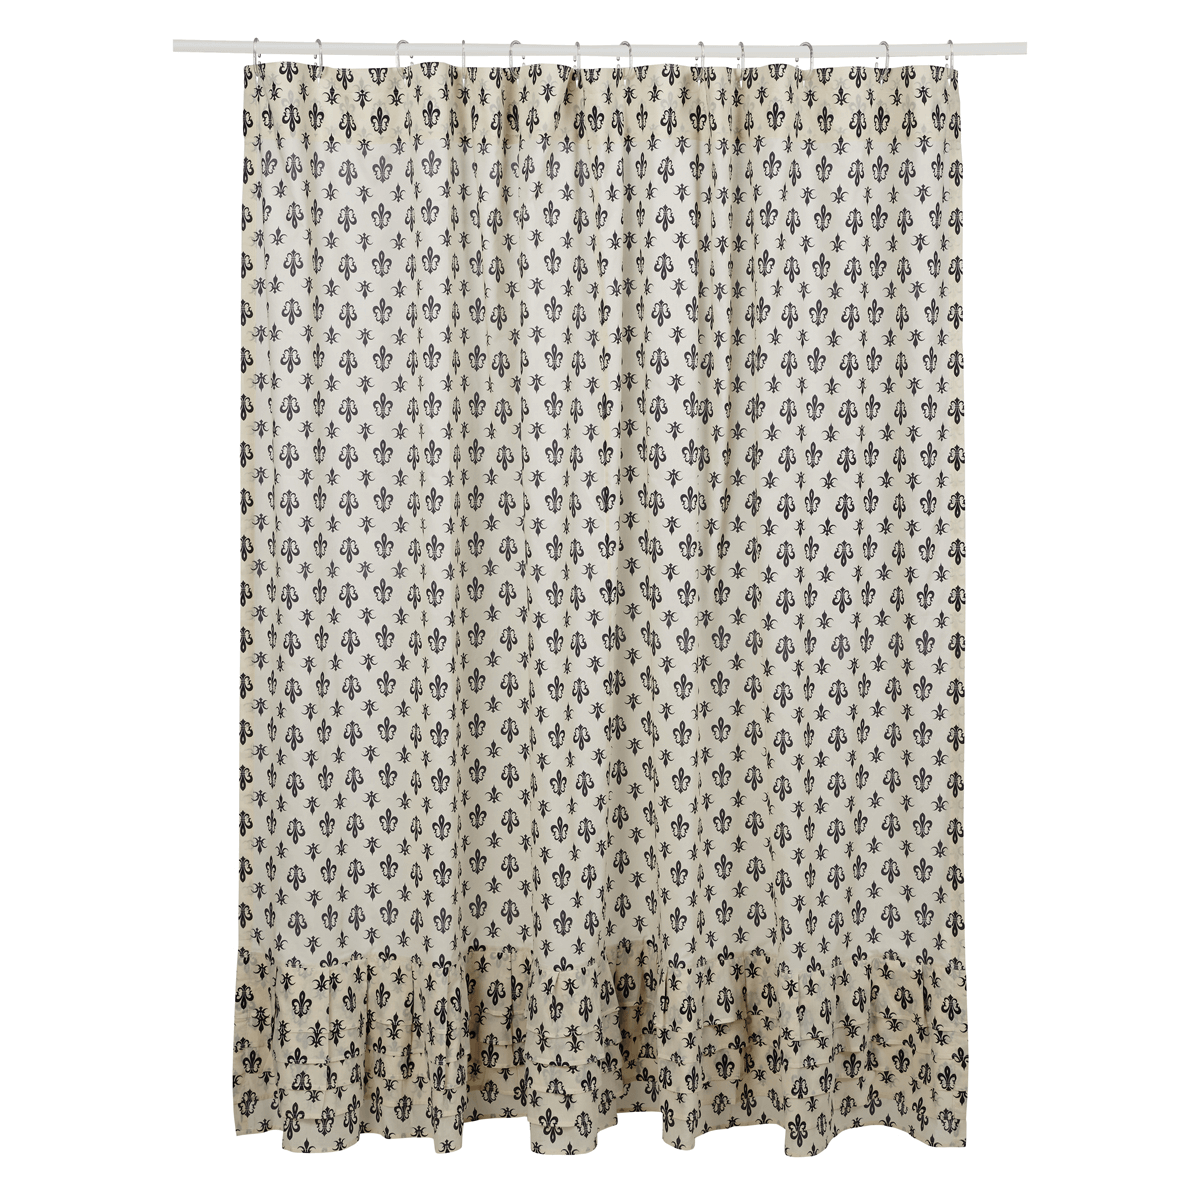 Elysee Fleur De Lis Shower Curtain Teton Timberline Trading